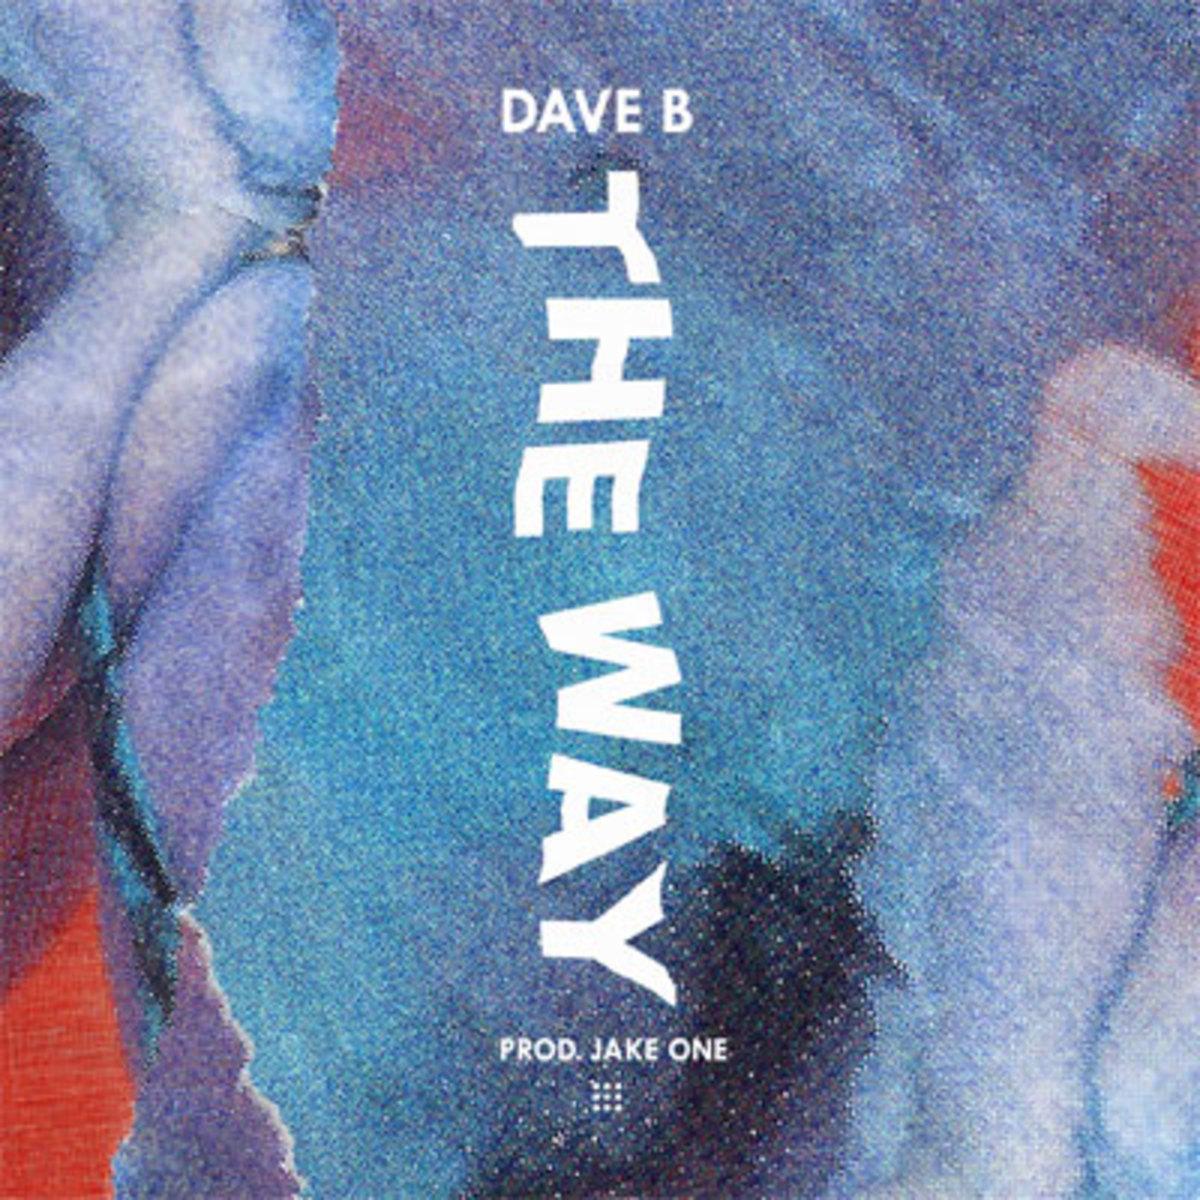 dave-b-the-way.jpg